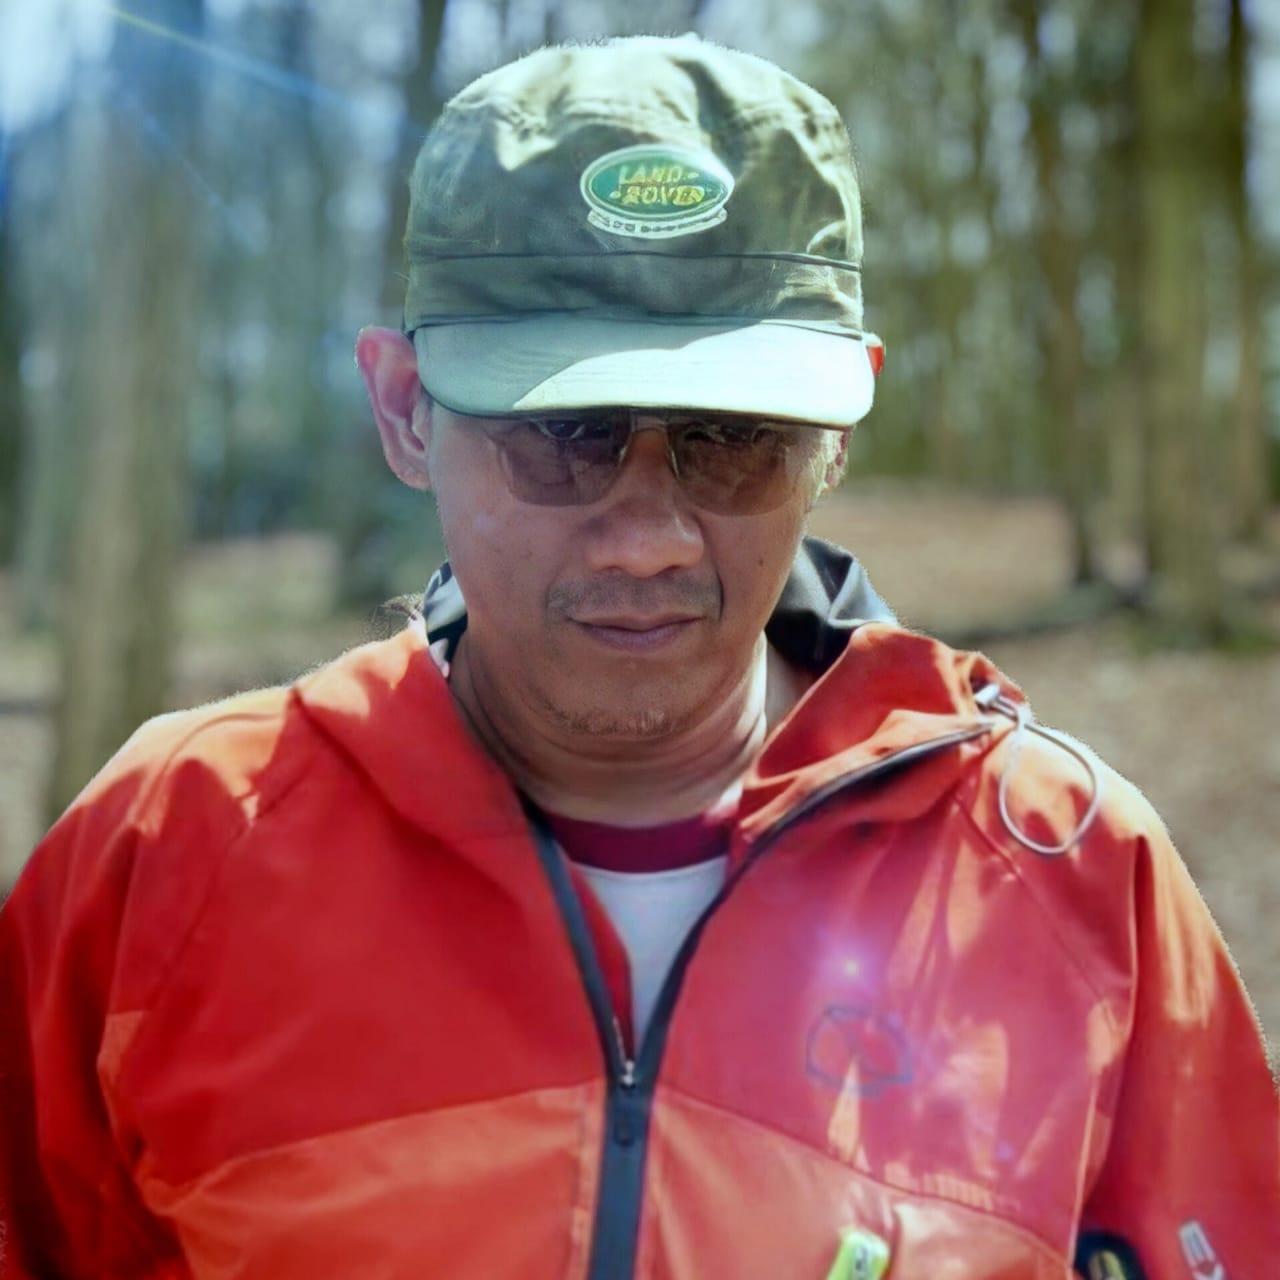 FK3I Jawa Barat Sebut Anggaran Penanaman Pohon dan Pemeliharaan Hutan Diduga Jadi Bancakan 233